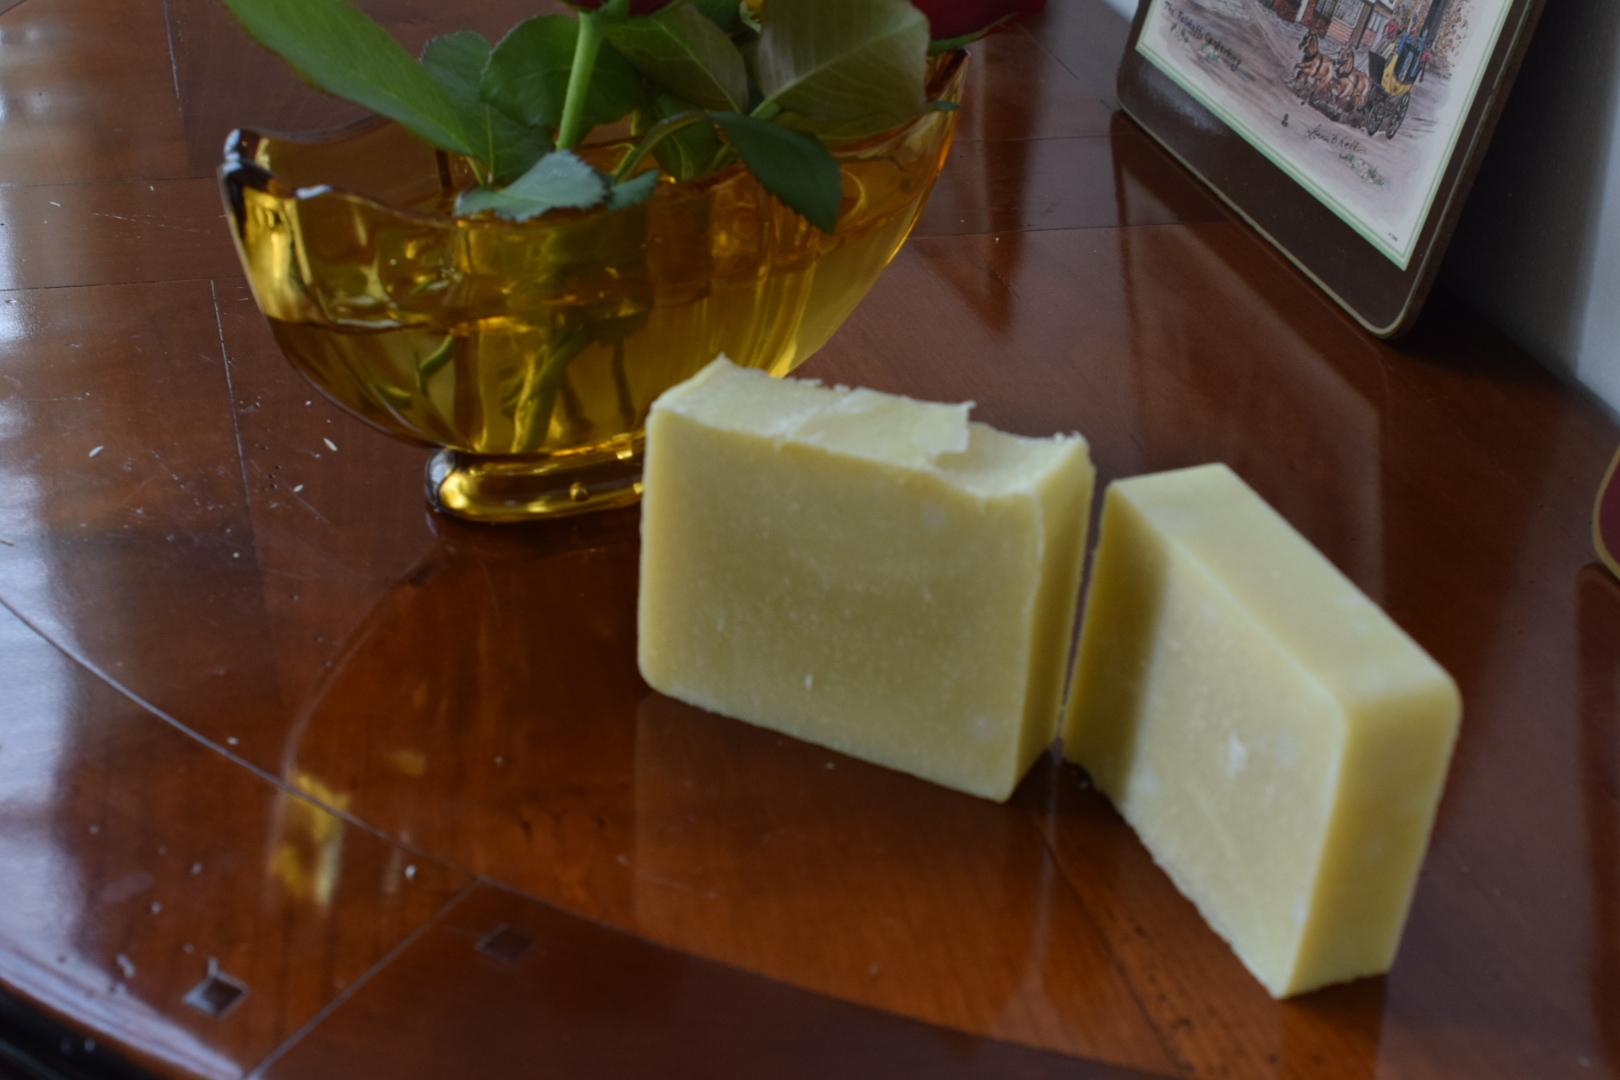 verbena aromatherapy soap artisanal